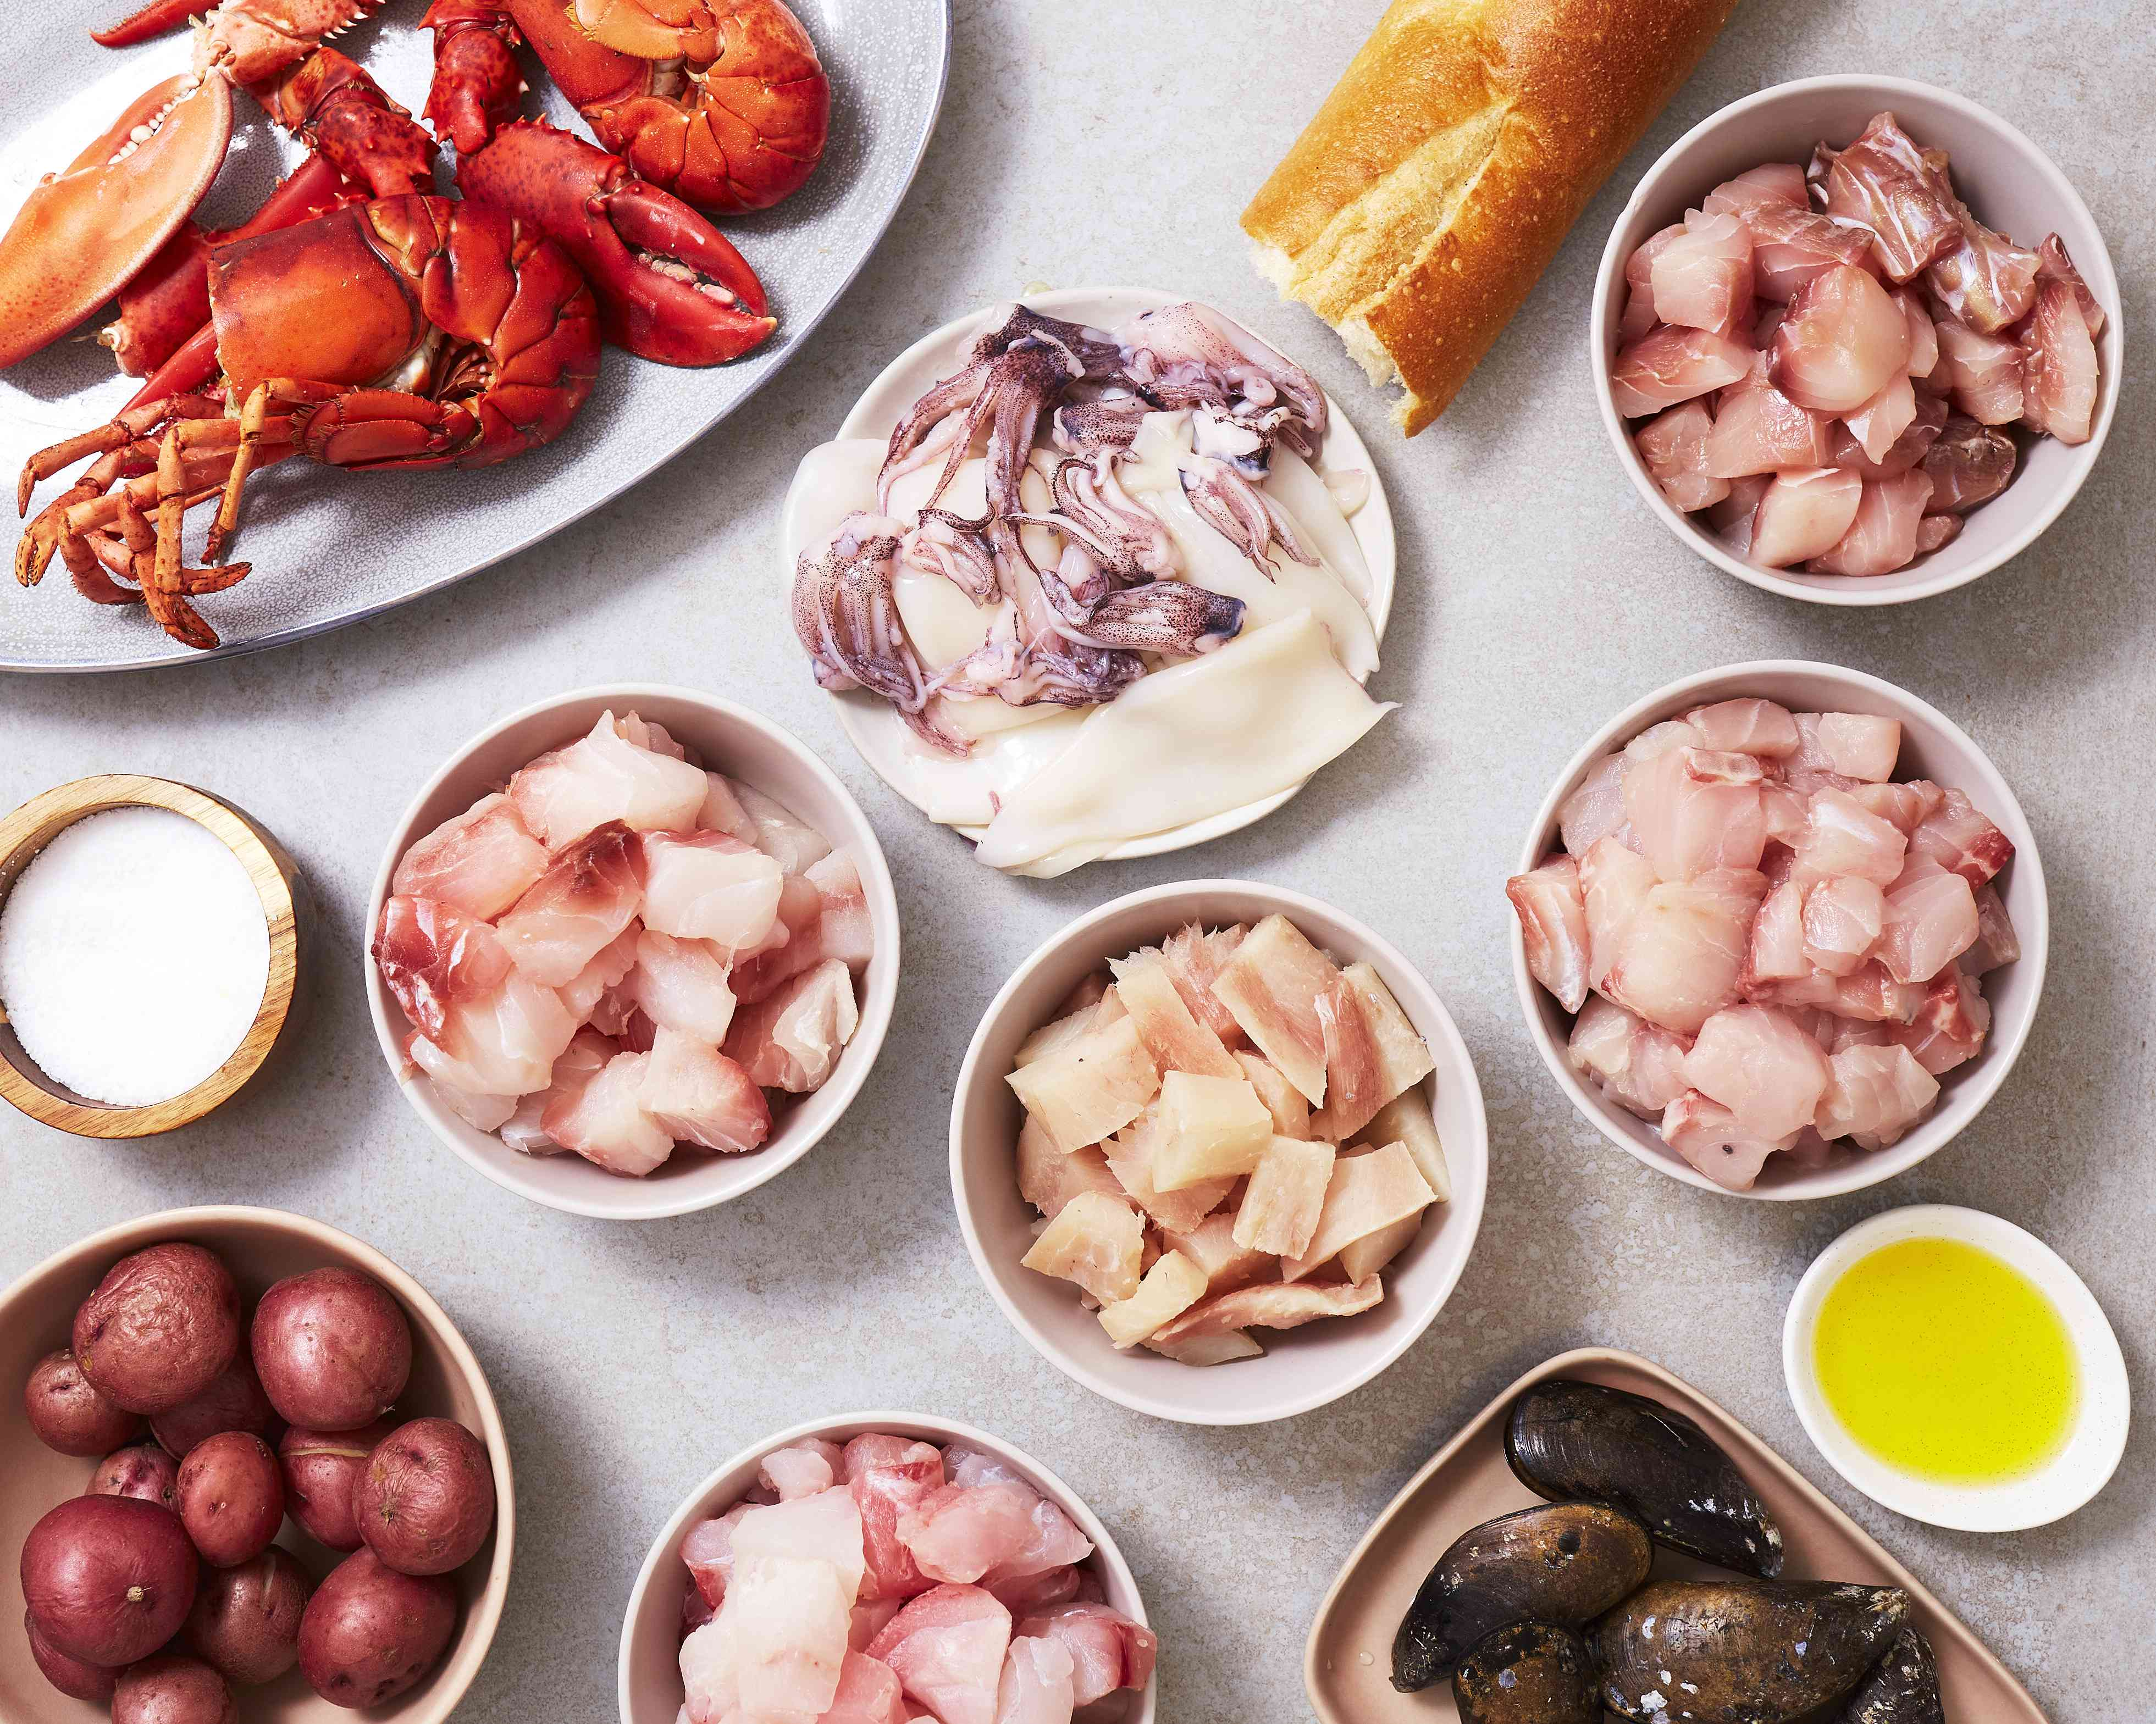 Bouillabaisse ingredients